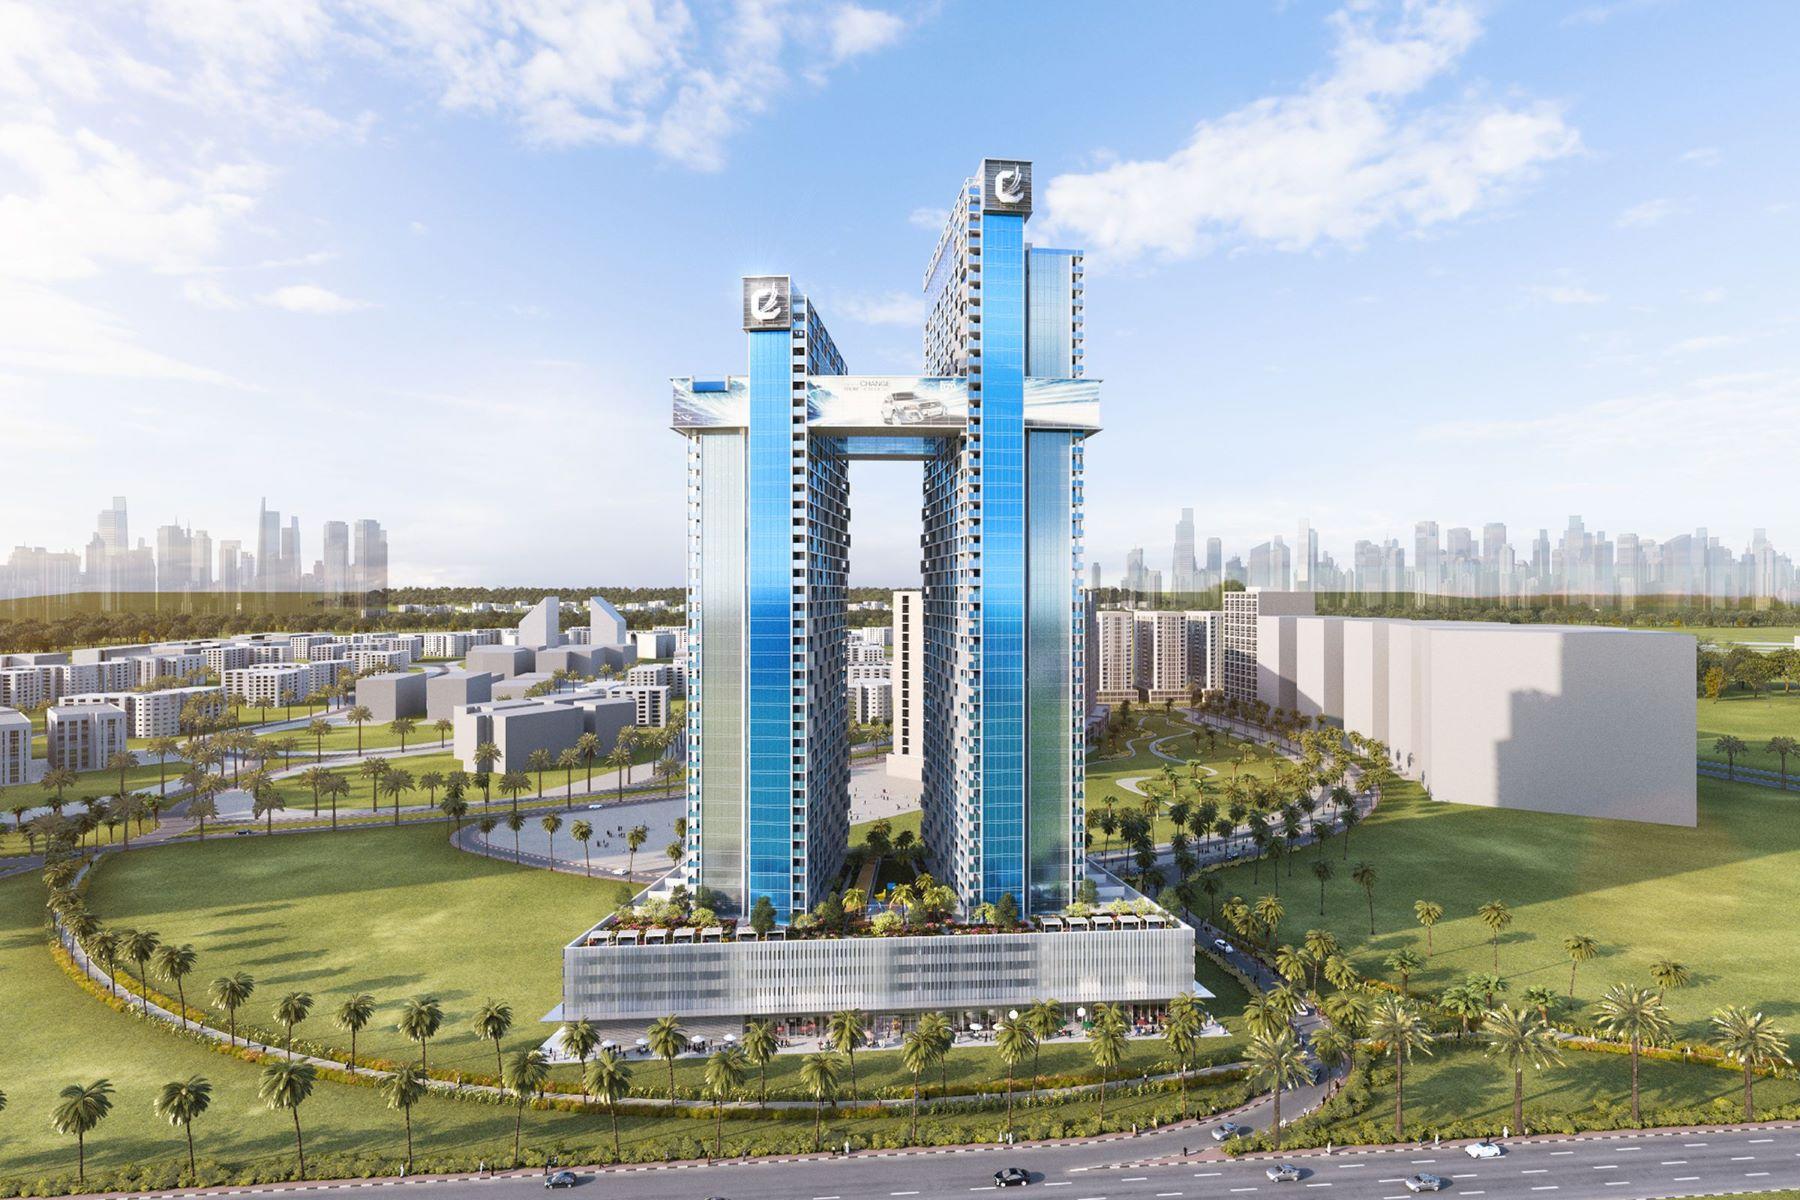 apartments for Sale at Cayan Cantara by Rotana Dubai, Dubai United Arab Emirates